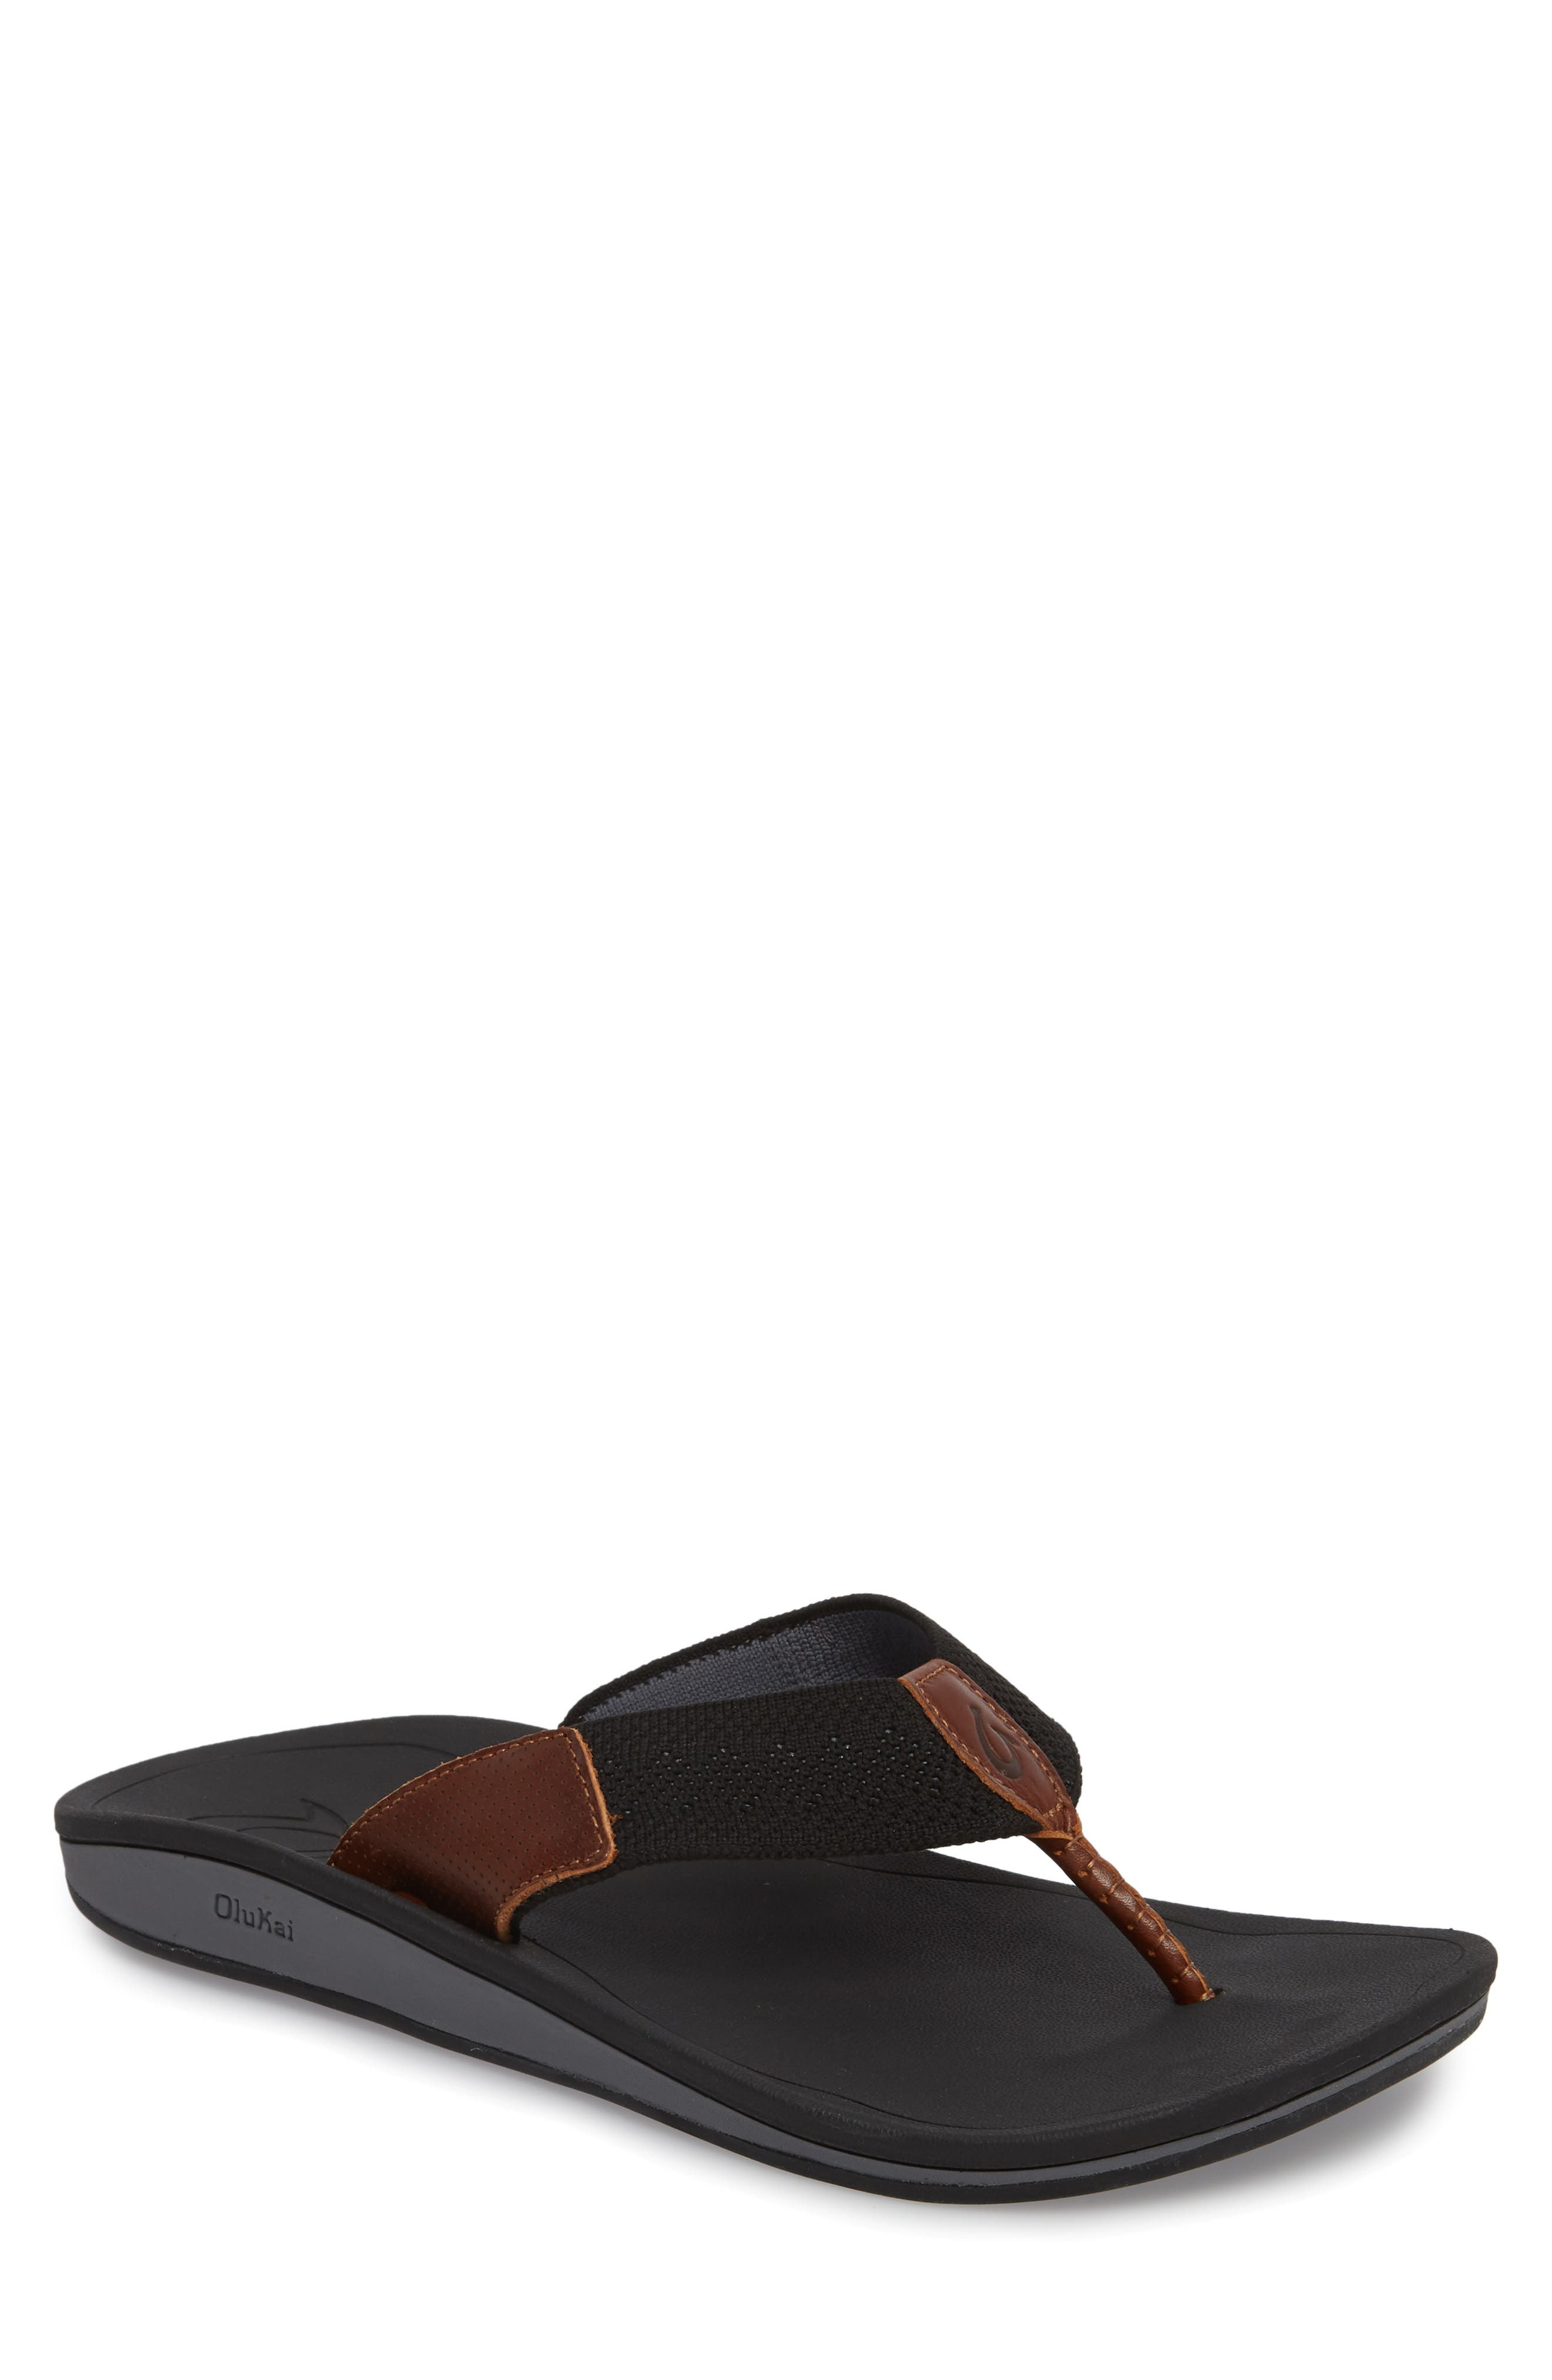 Nohona Ulana Flip Flop,                         Main,                         color, Black/ Black Leather